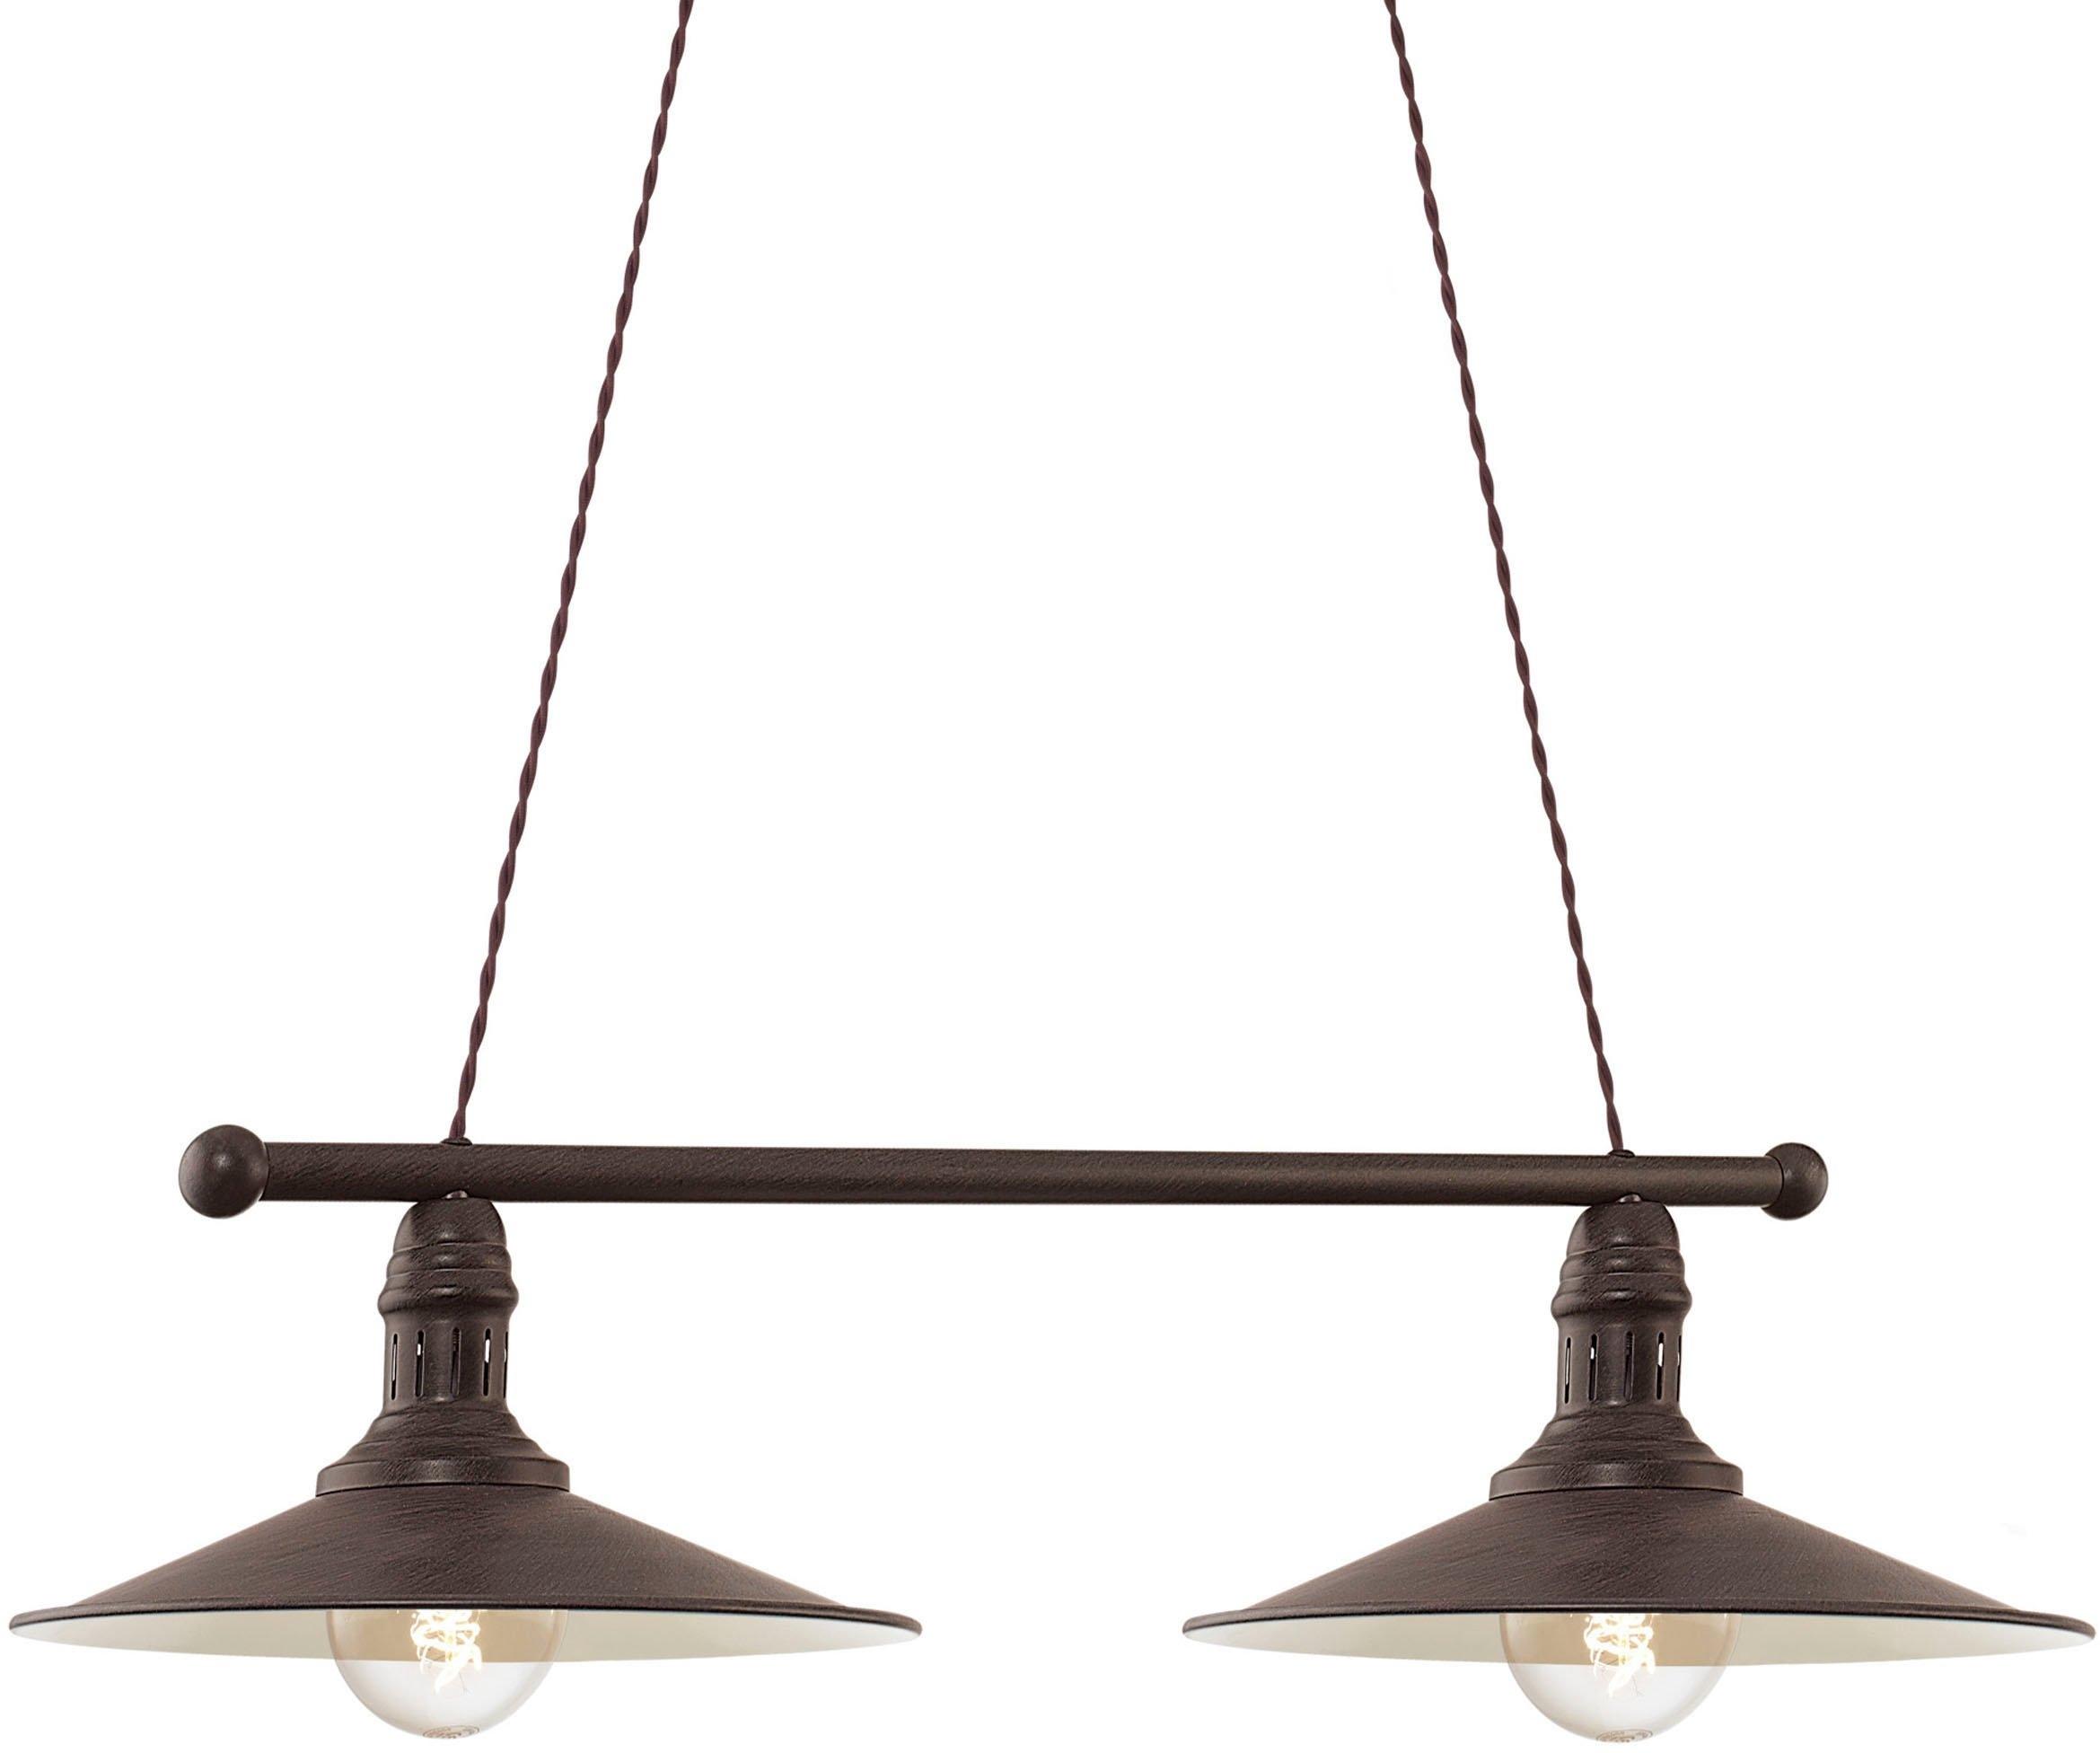 EGLO hanglamp STOCKBURY Hanglicht, hanglamp - gratis ruilen op otto.nl